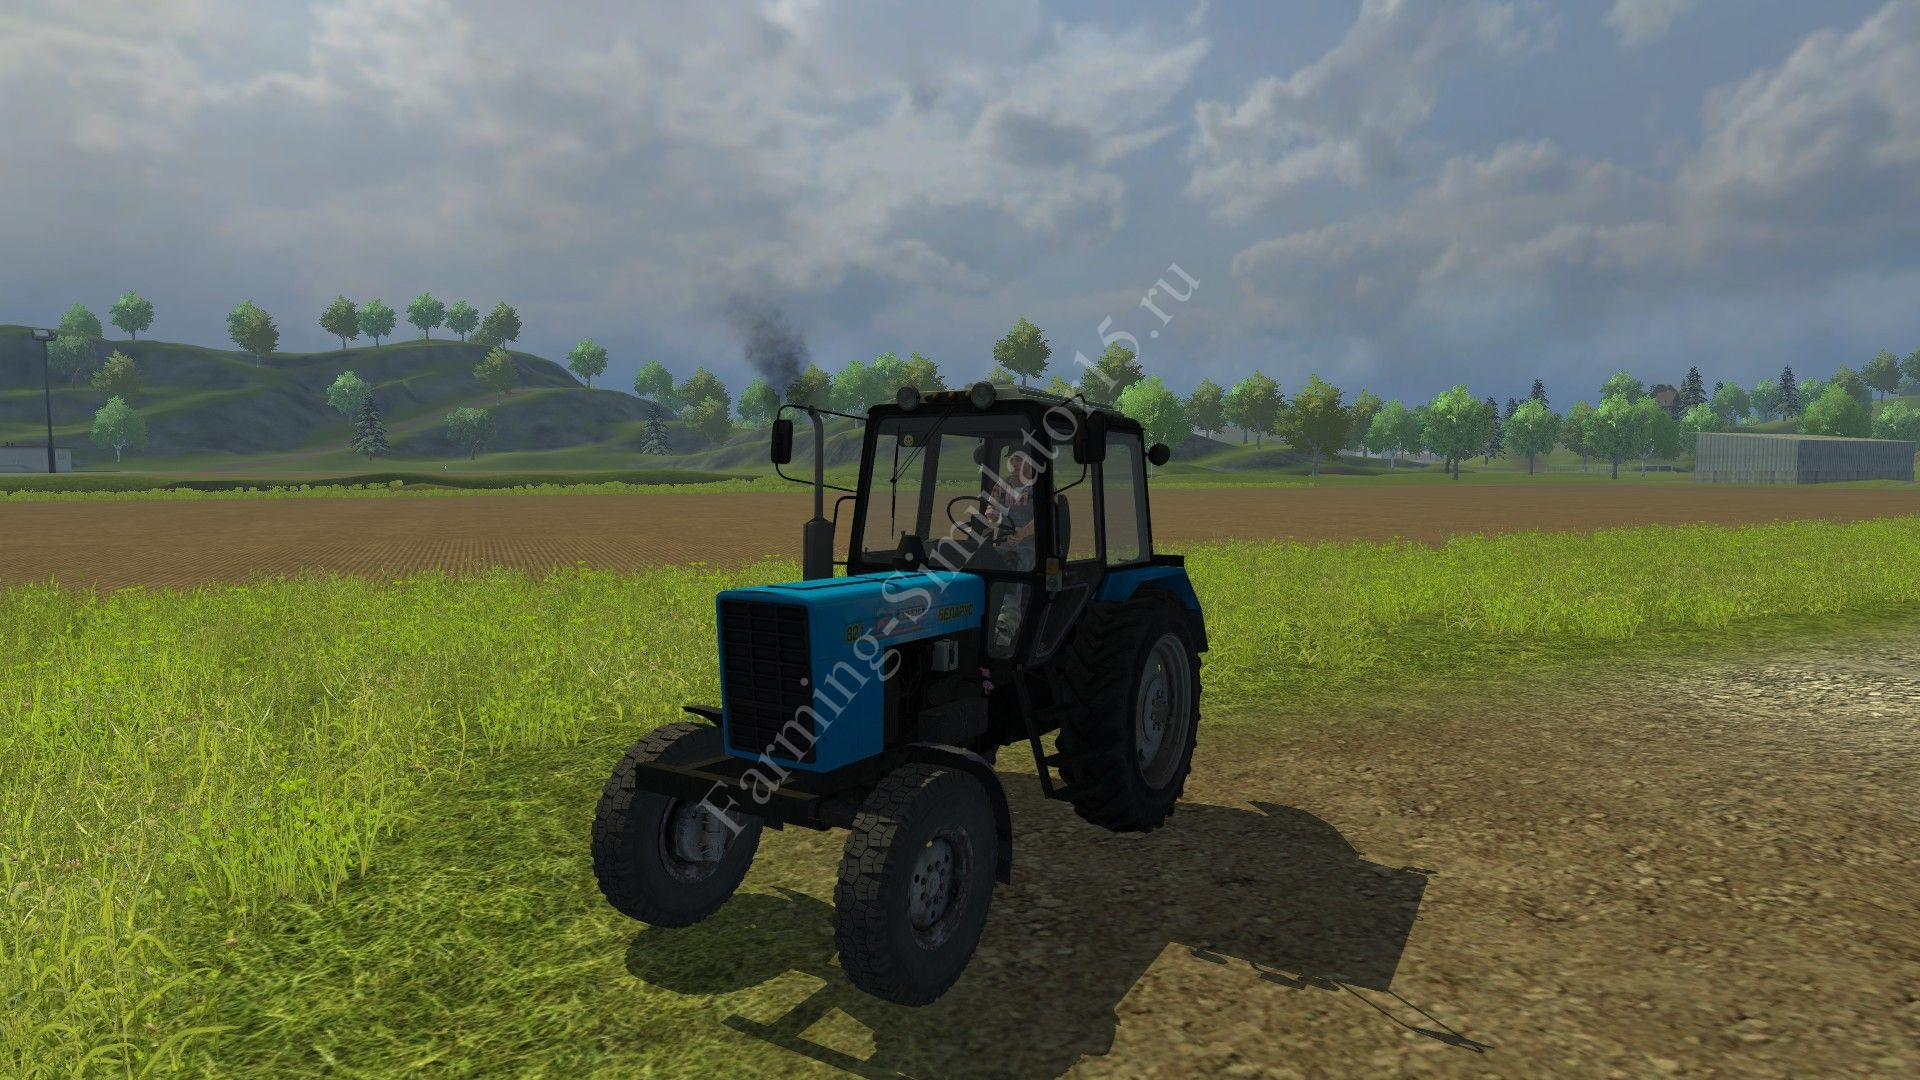 Мод трактора Беларус MTZ 82.1 v 2.0 Farming Simulator 2013, Farming Simulator 13